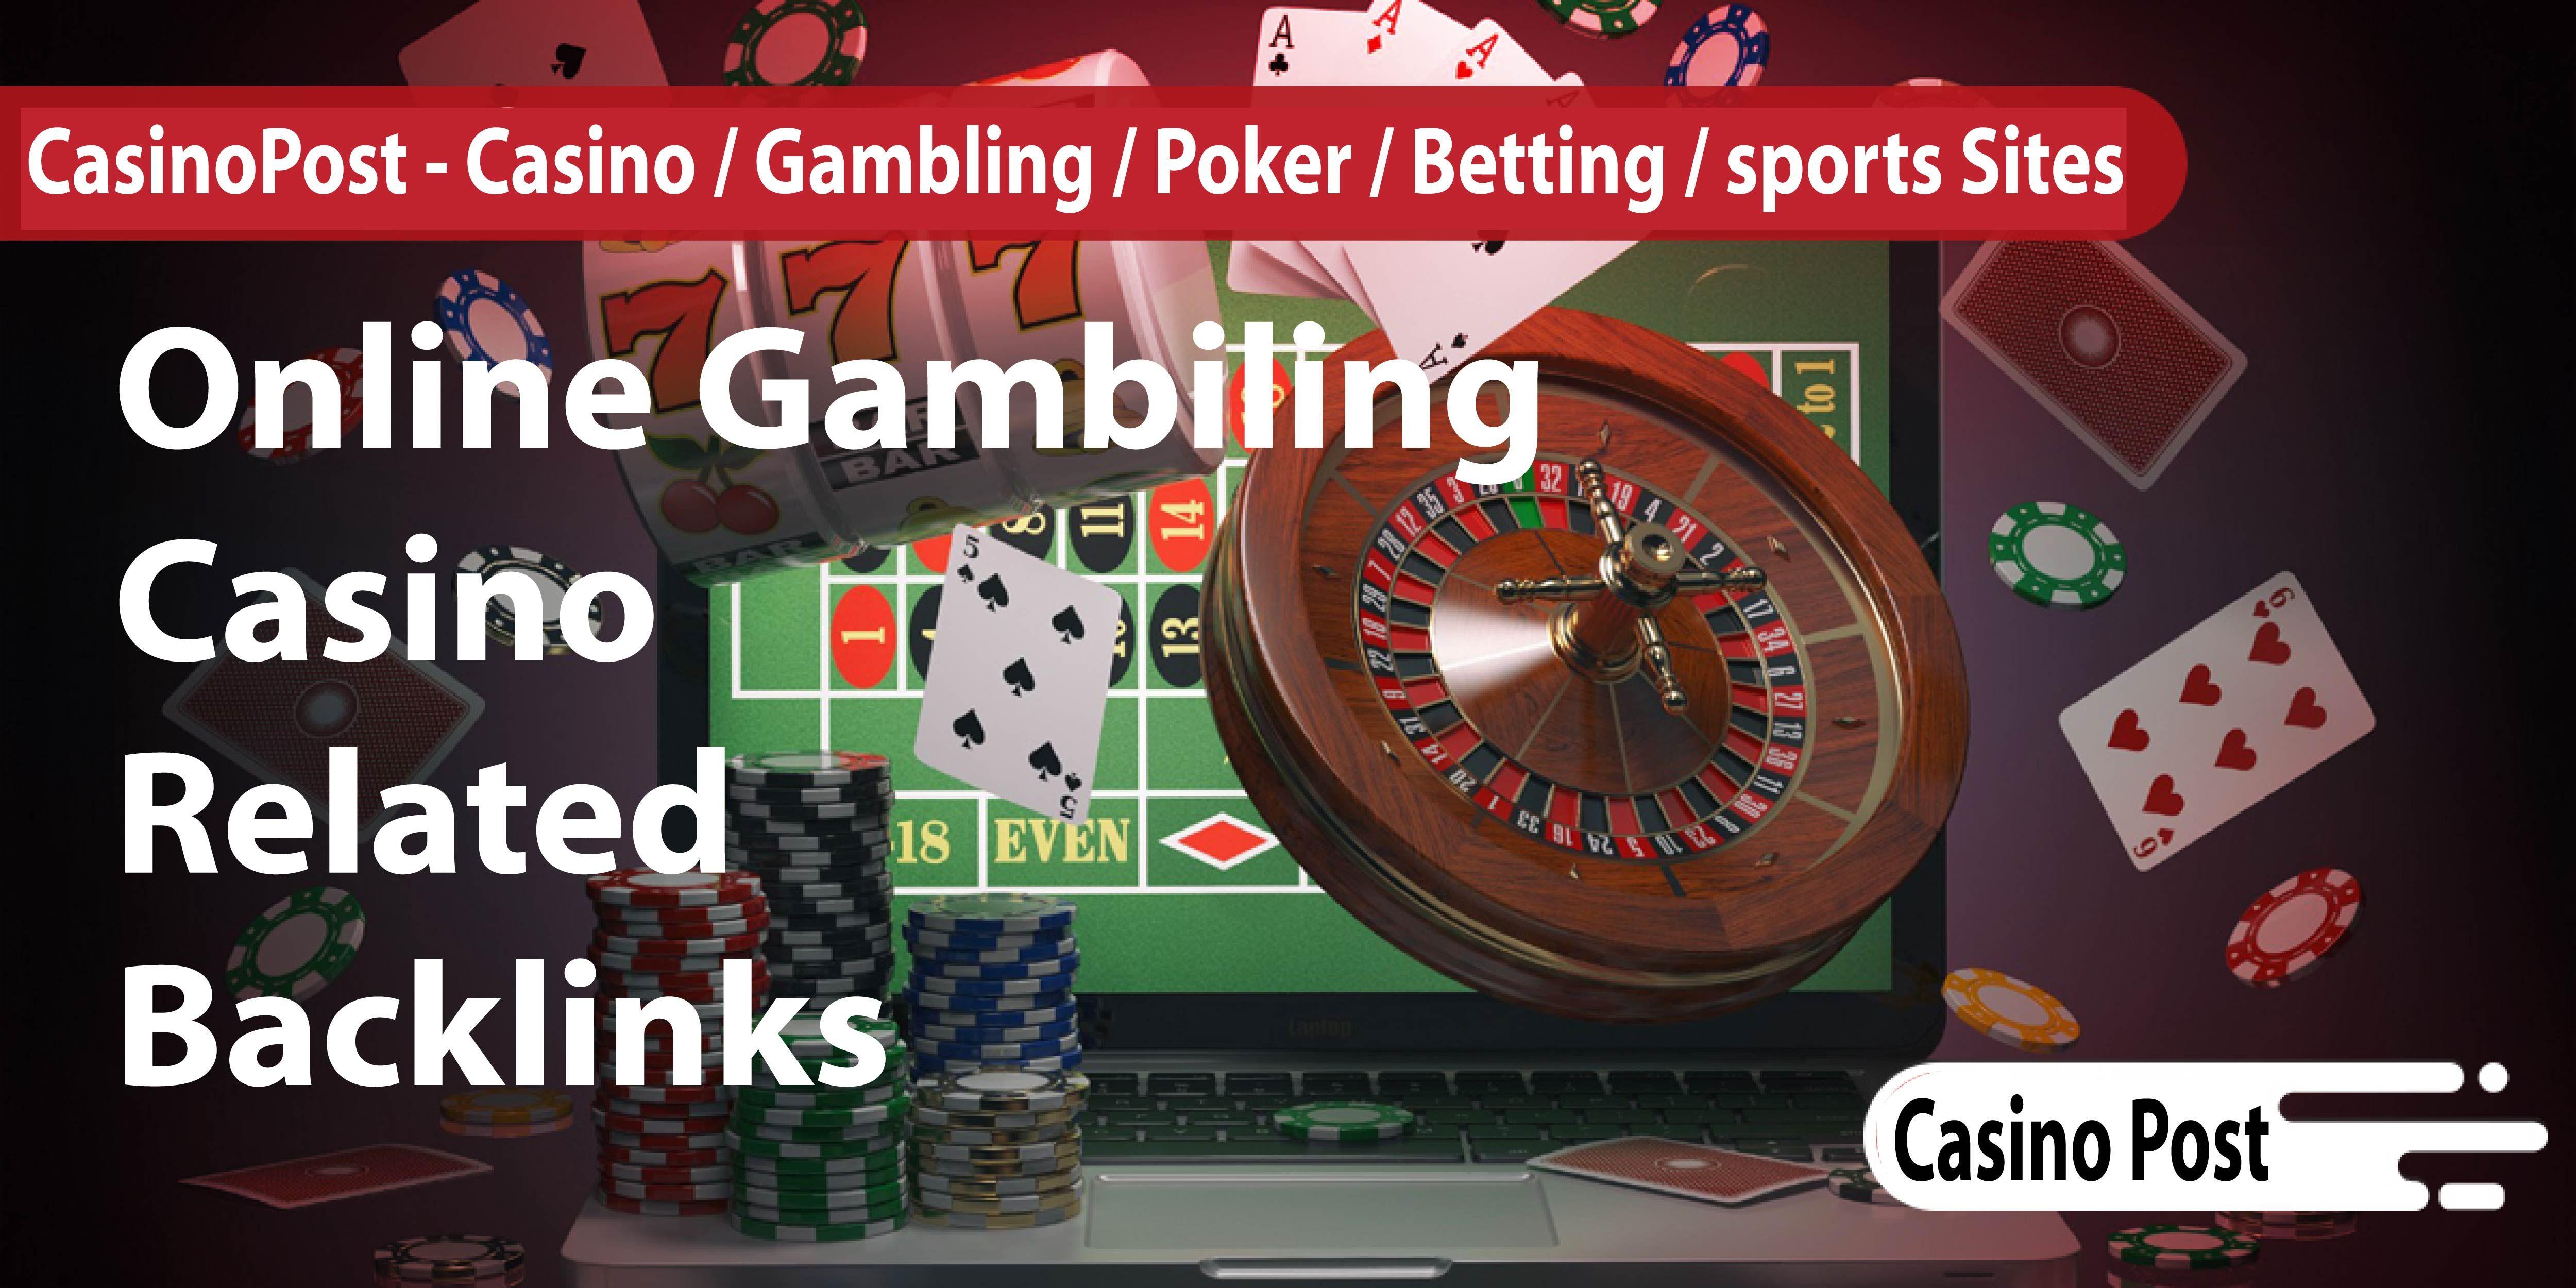 350 Powerful Casino Poker Sports Betting Gambling PBN Backlinks Dripfeed 30 days PBN Backlinks